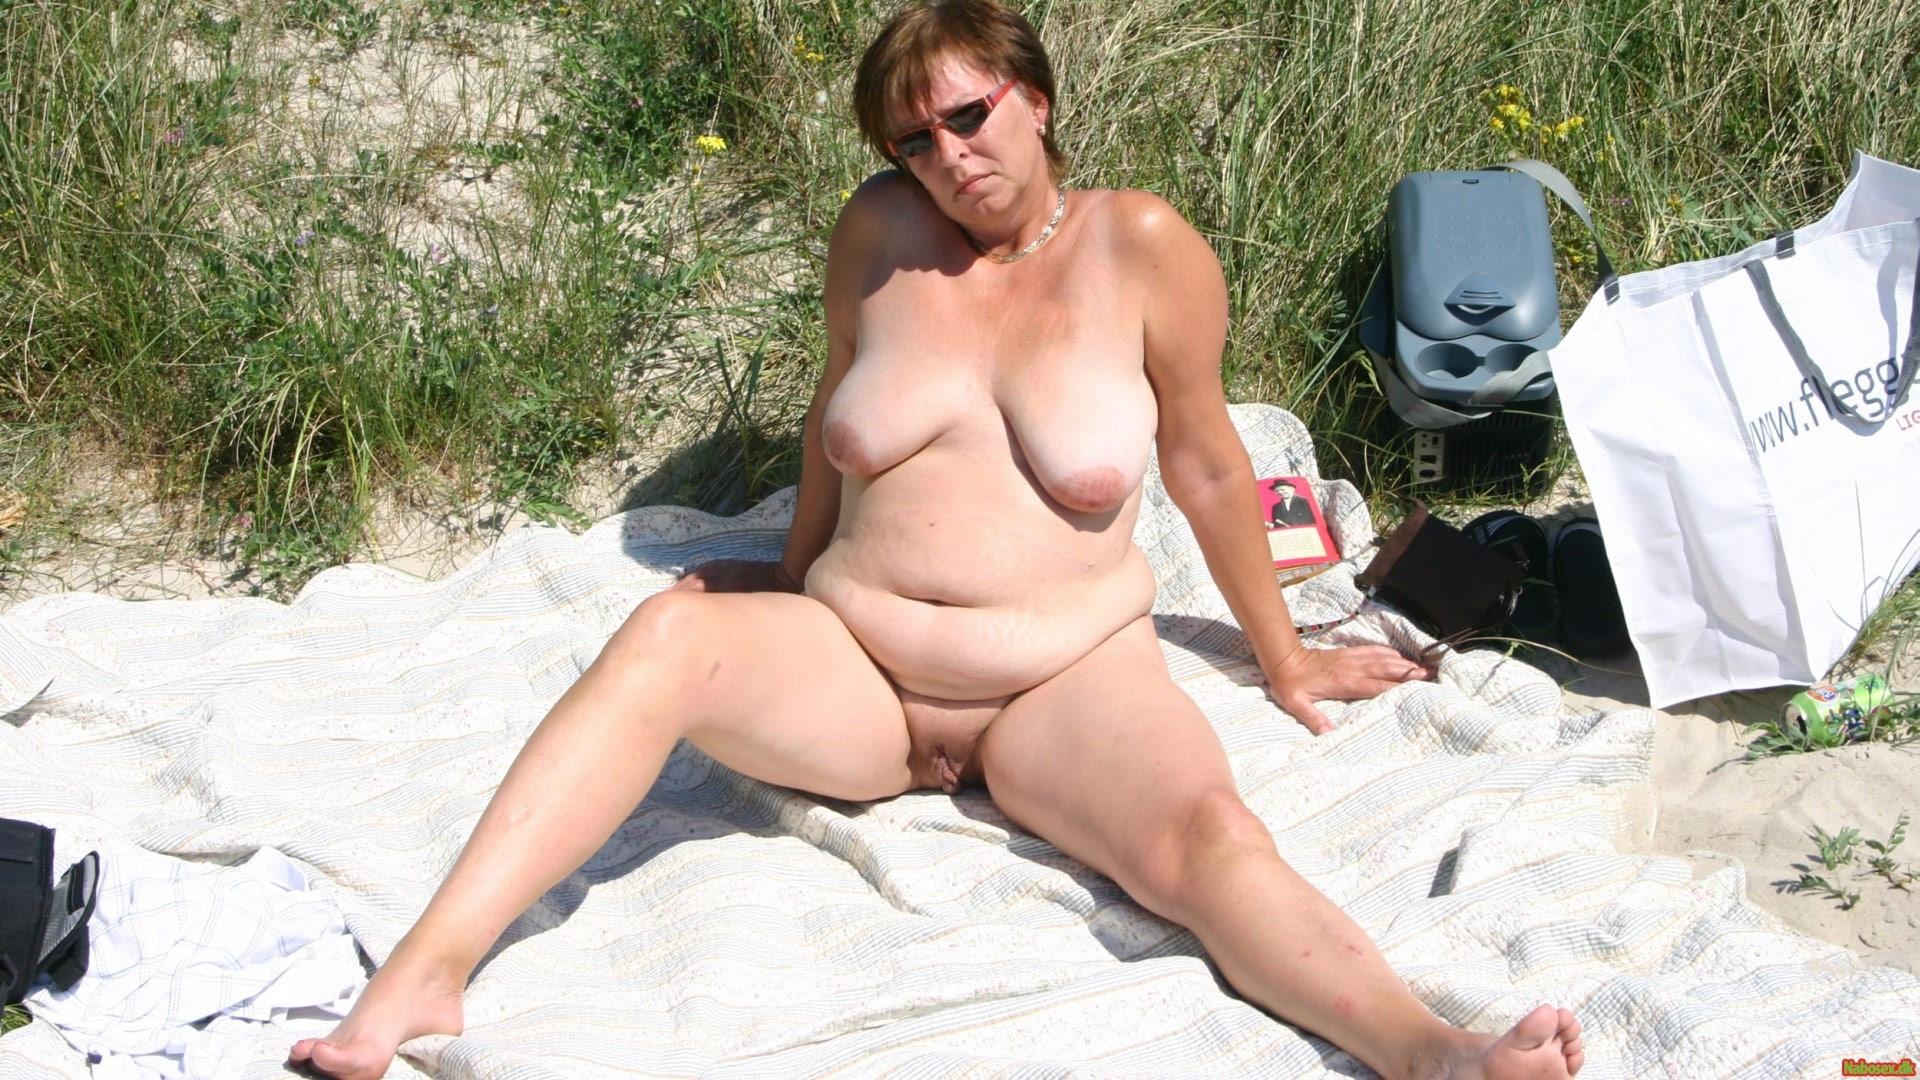 Congratulate, Plump women nude at the beach commit